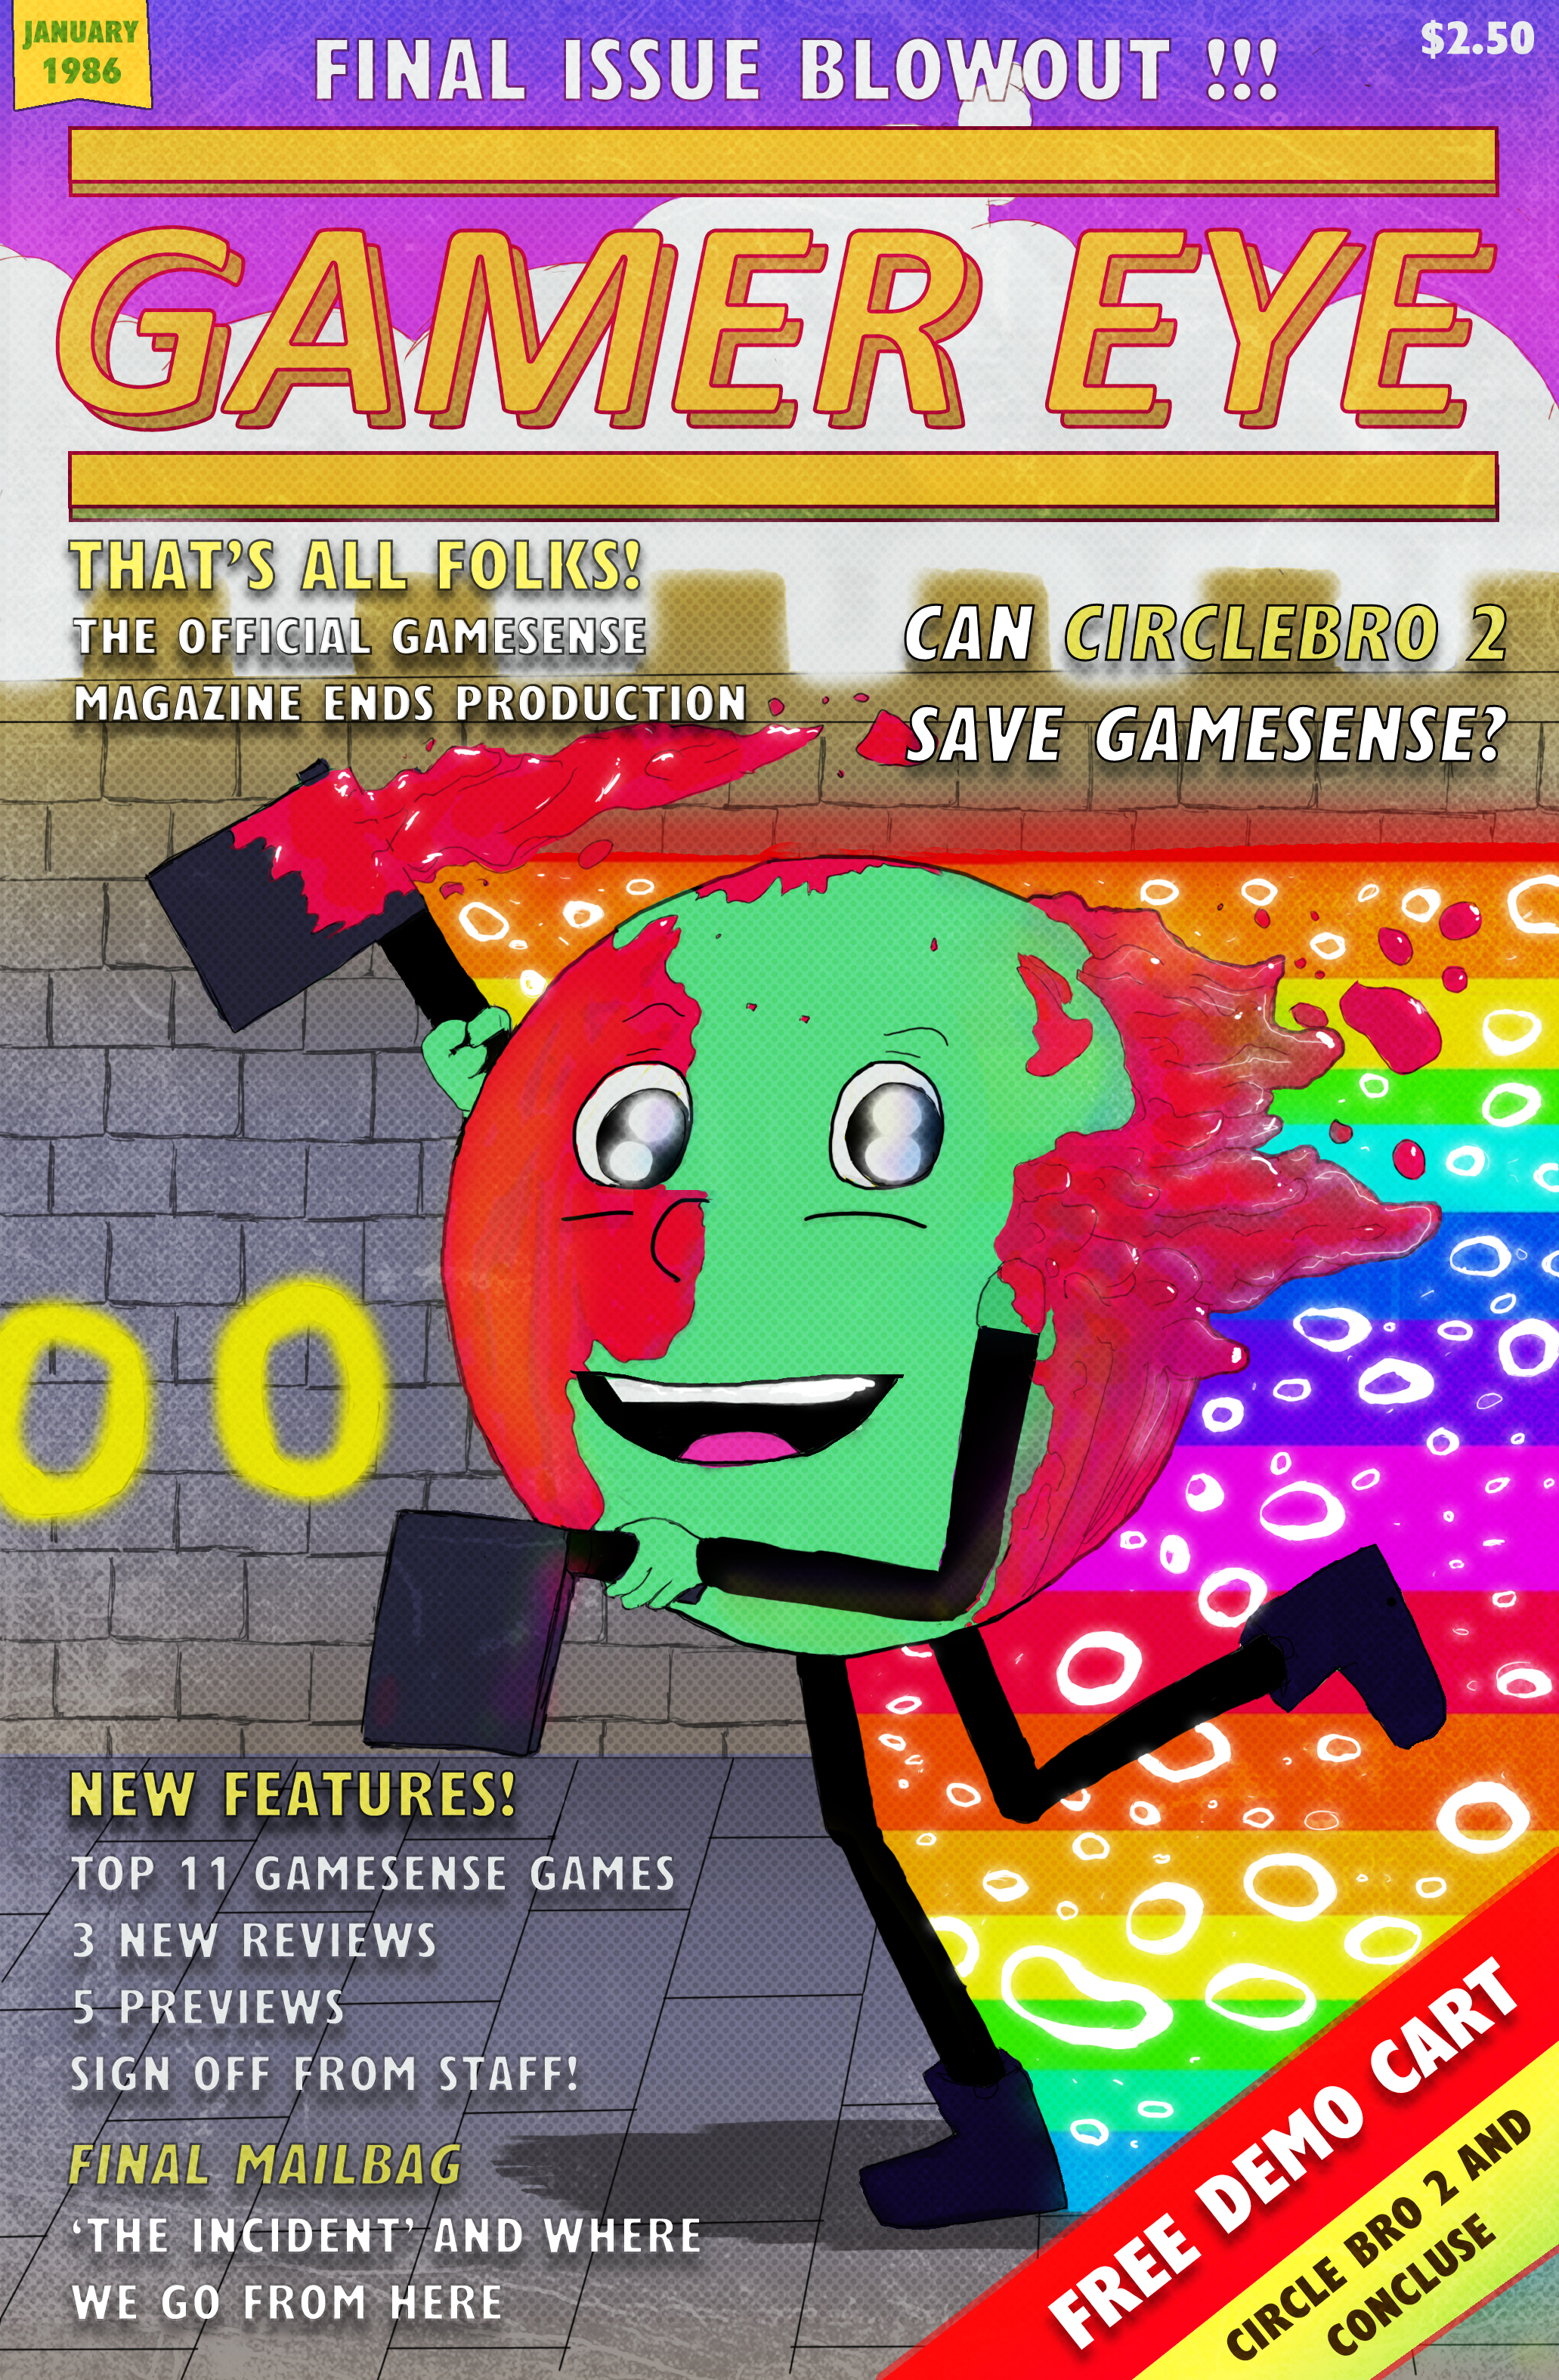 Gamer Eye Final Issue